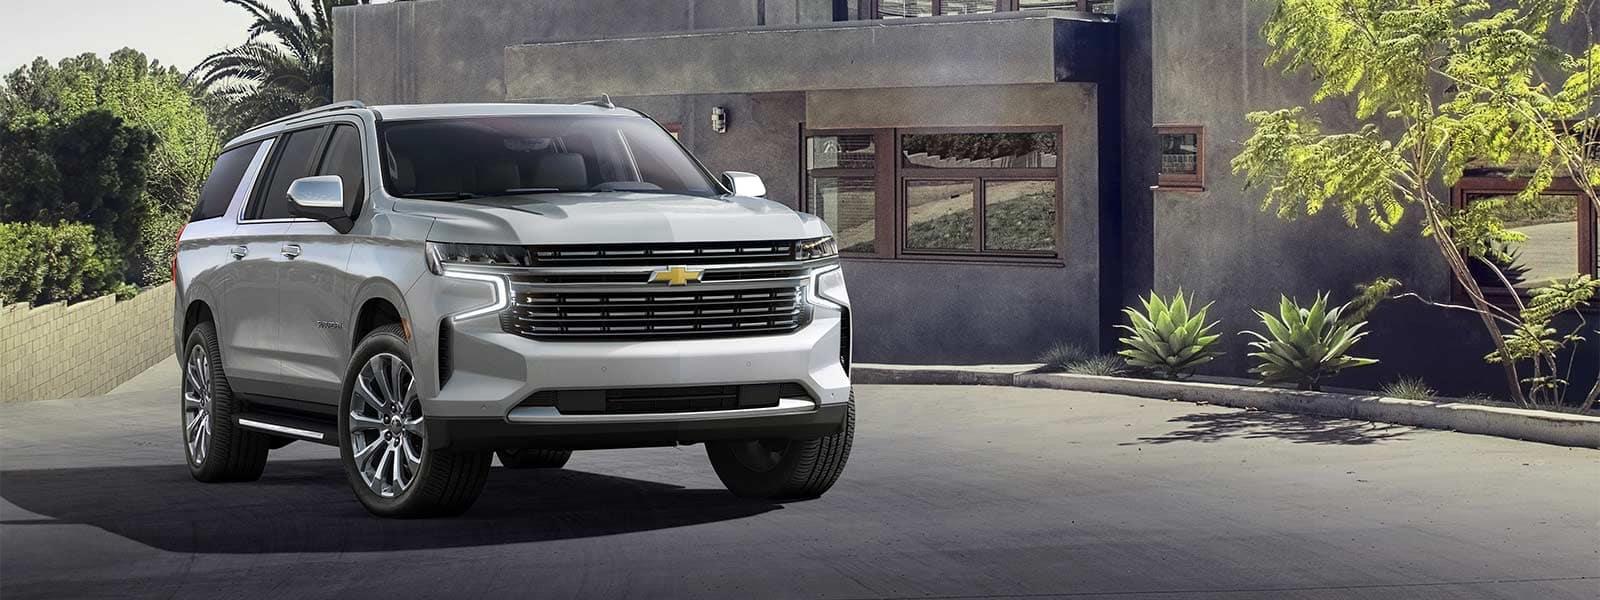 Buy new 2021 Chevrolet Suburban in Regina Saskatchewan